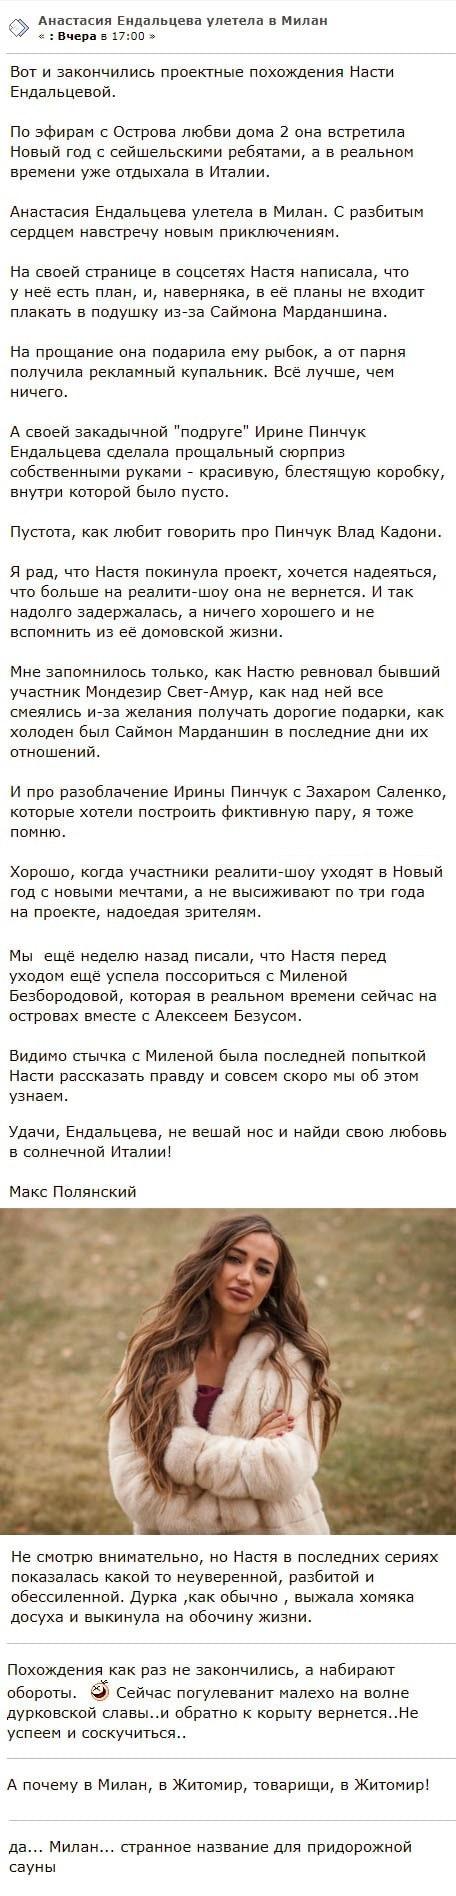 Анастасия Ендальцева больше не участница Дома-2